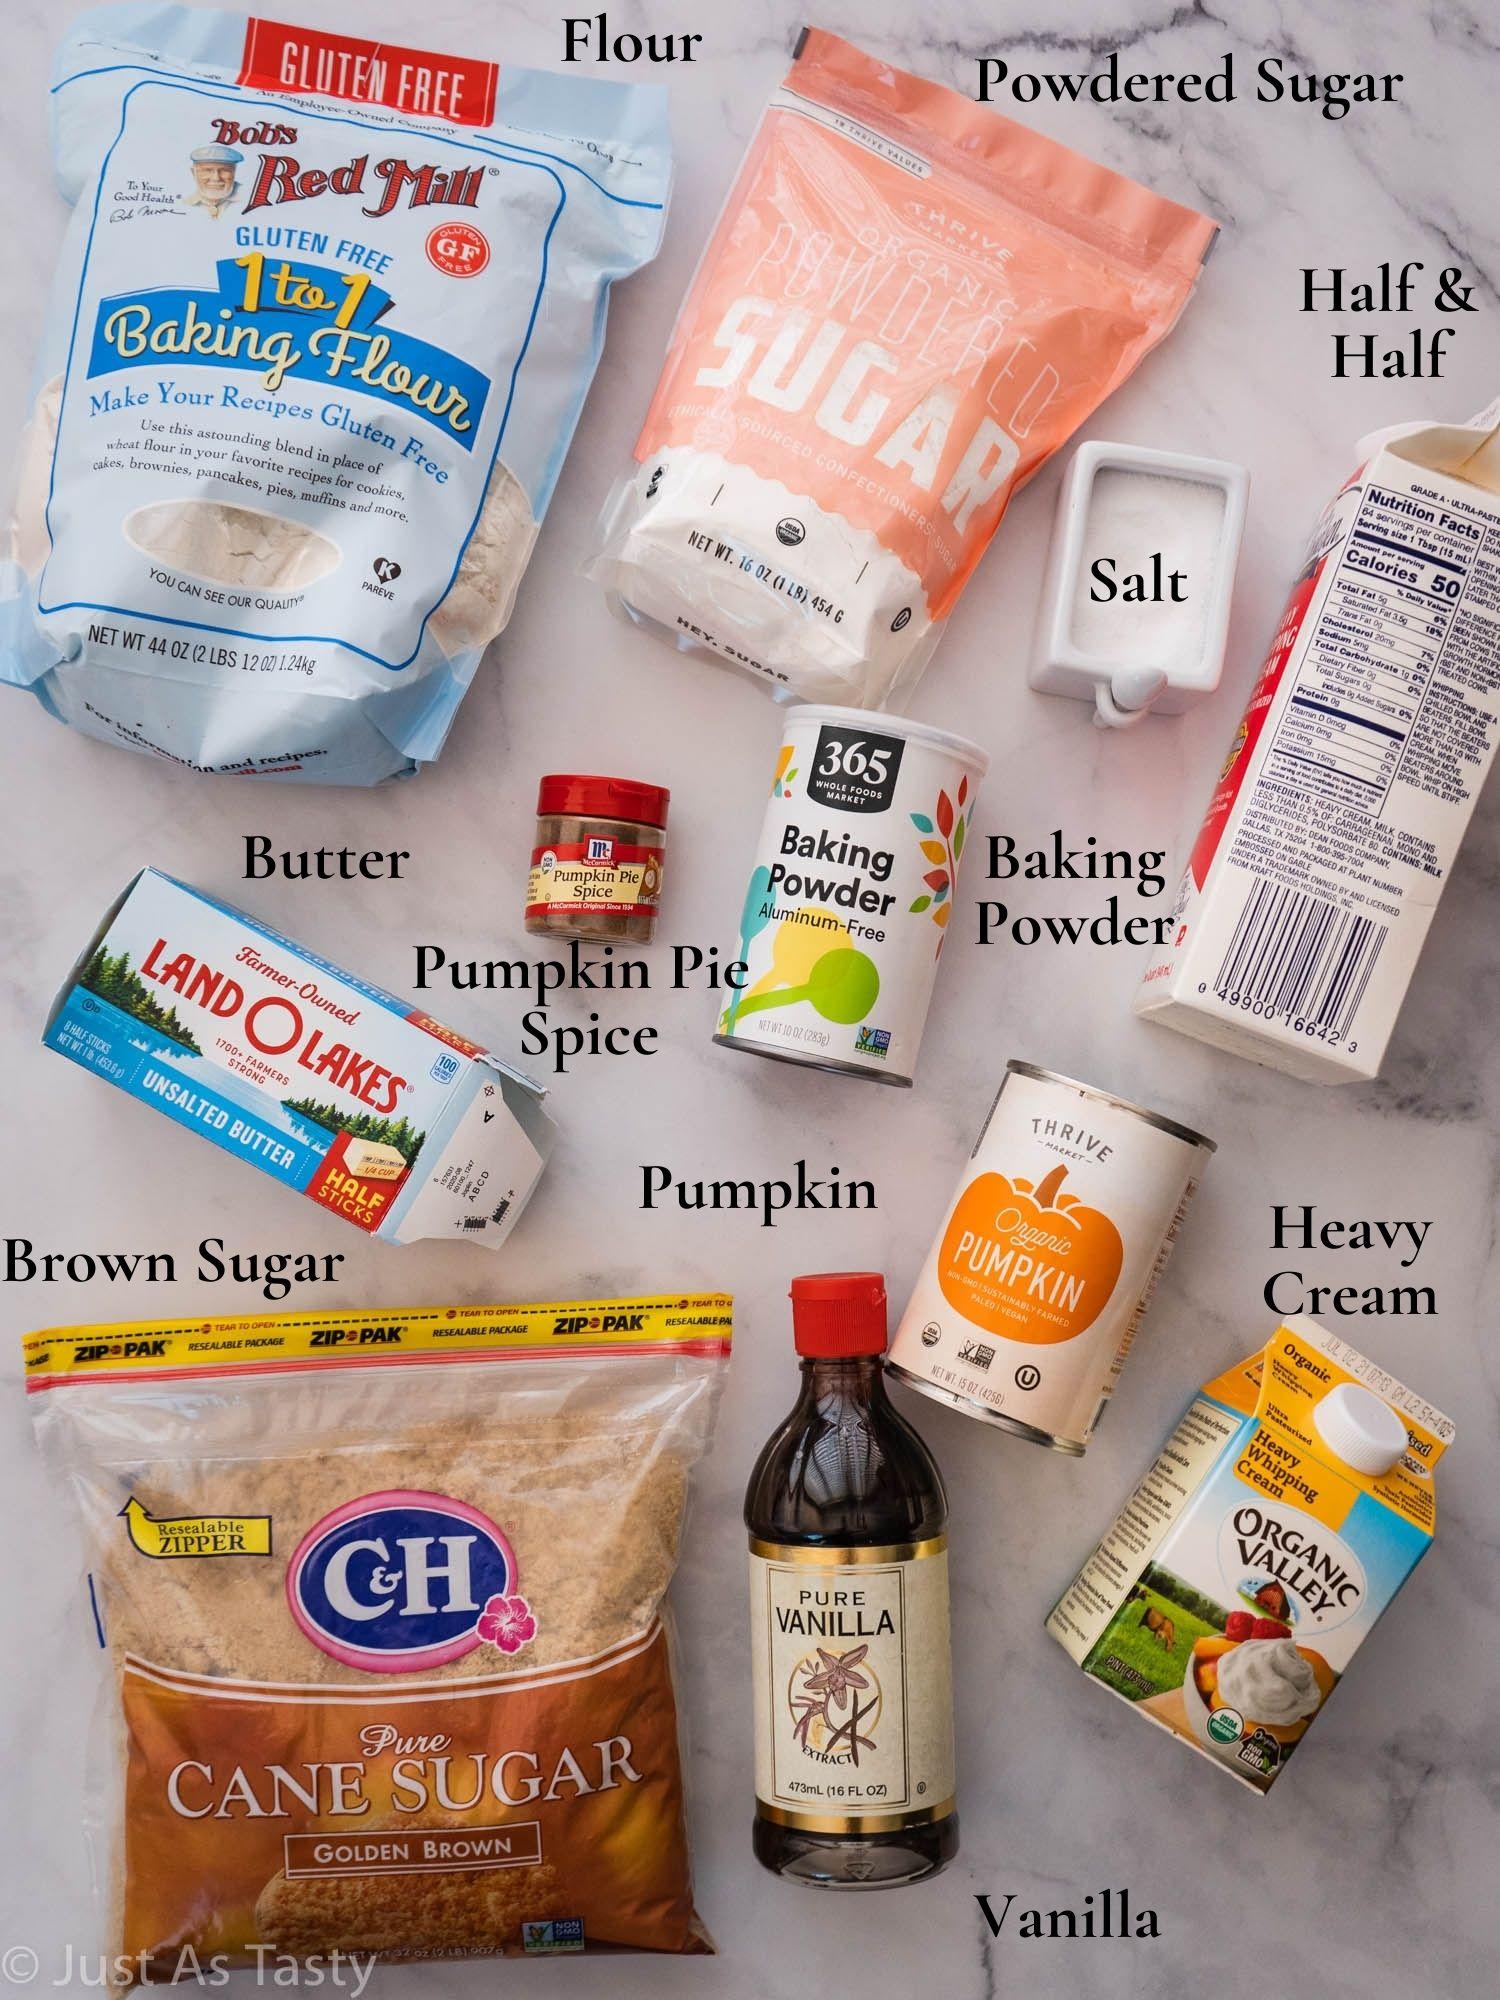 Pumpkin scone ingredients.